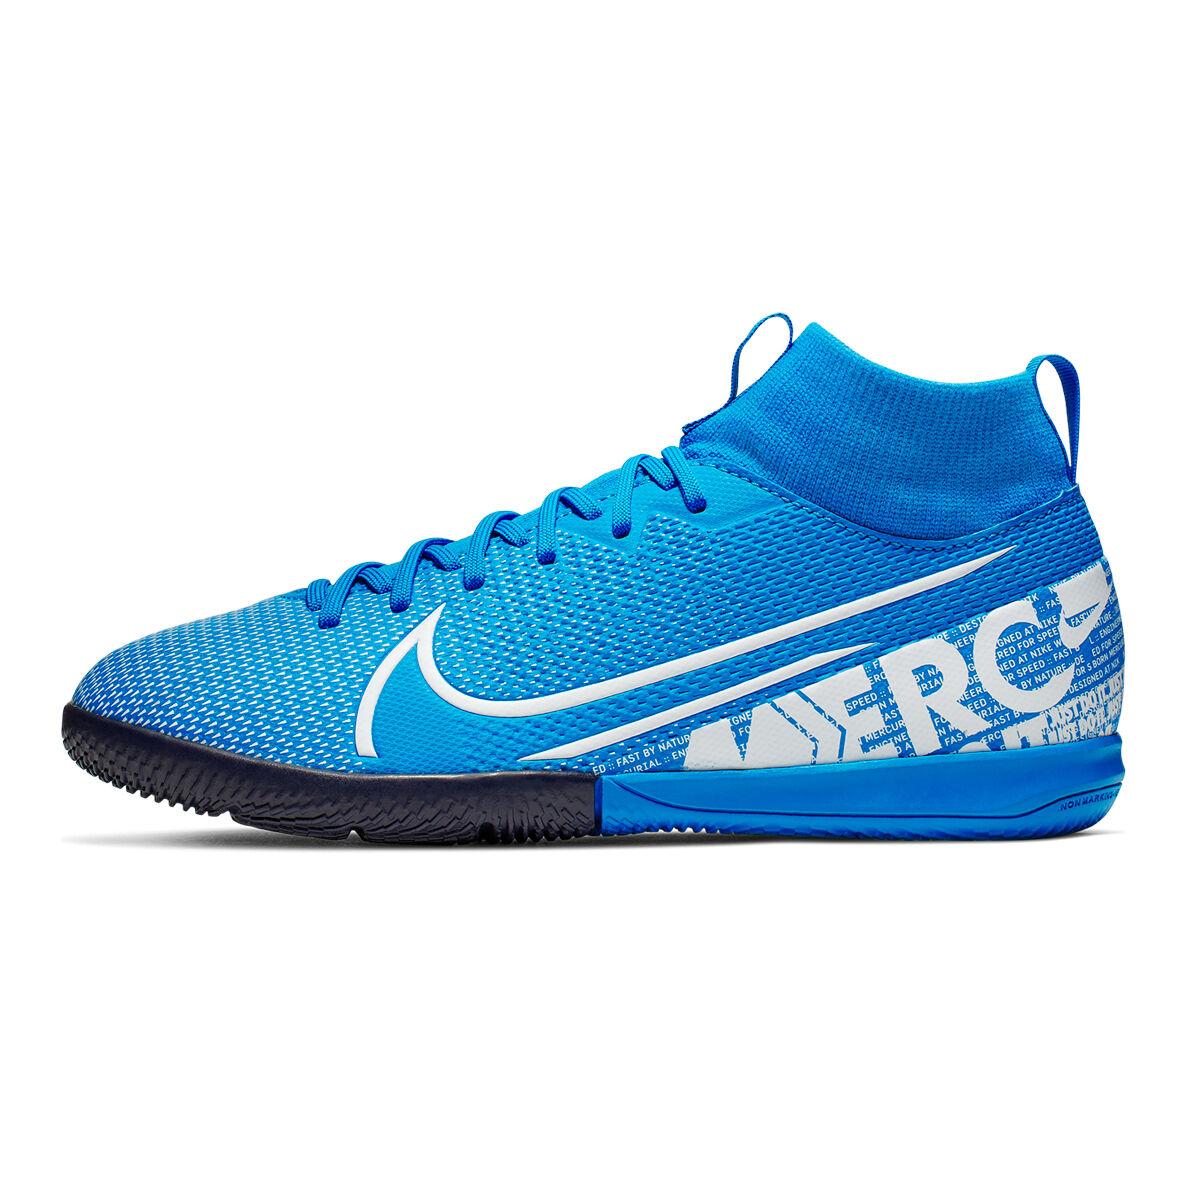 Nike Mercurial Superfly VII Academy